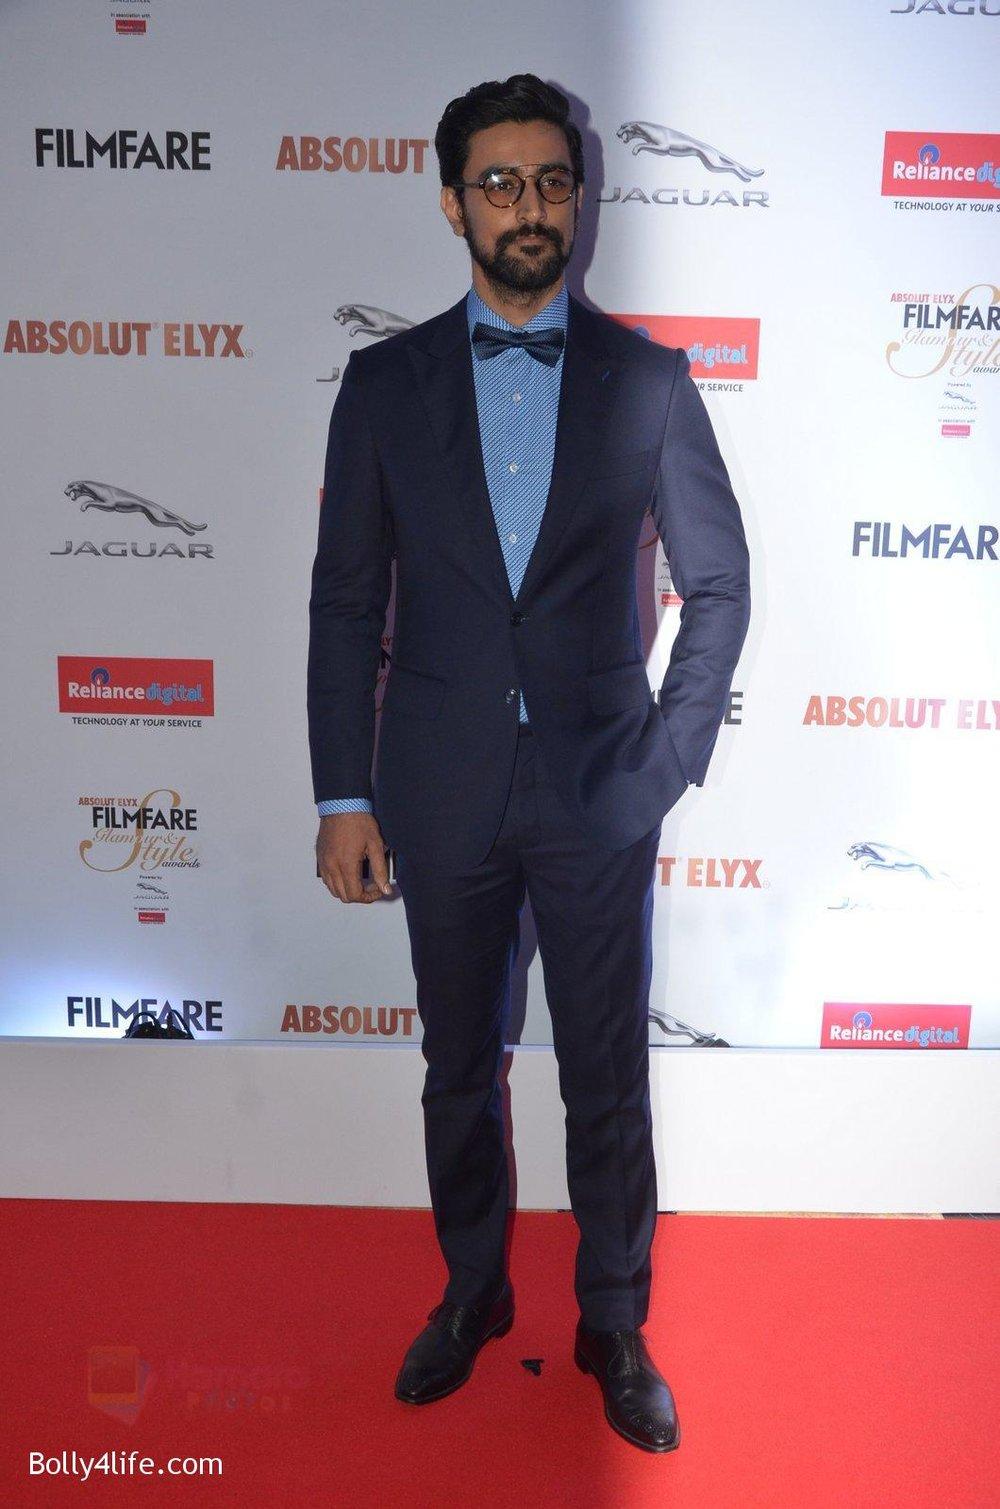 Kunal-Kapoor-at-Filmfare-Glamour-Style-Awards-2016-in-Mumbai-on-15th-Oct-2016-1808.jpg